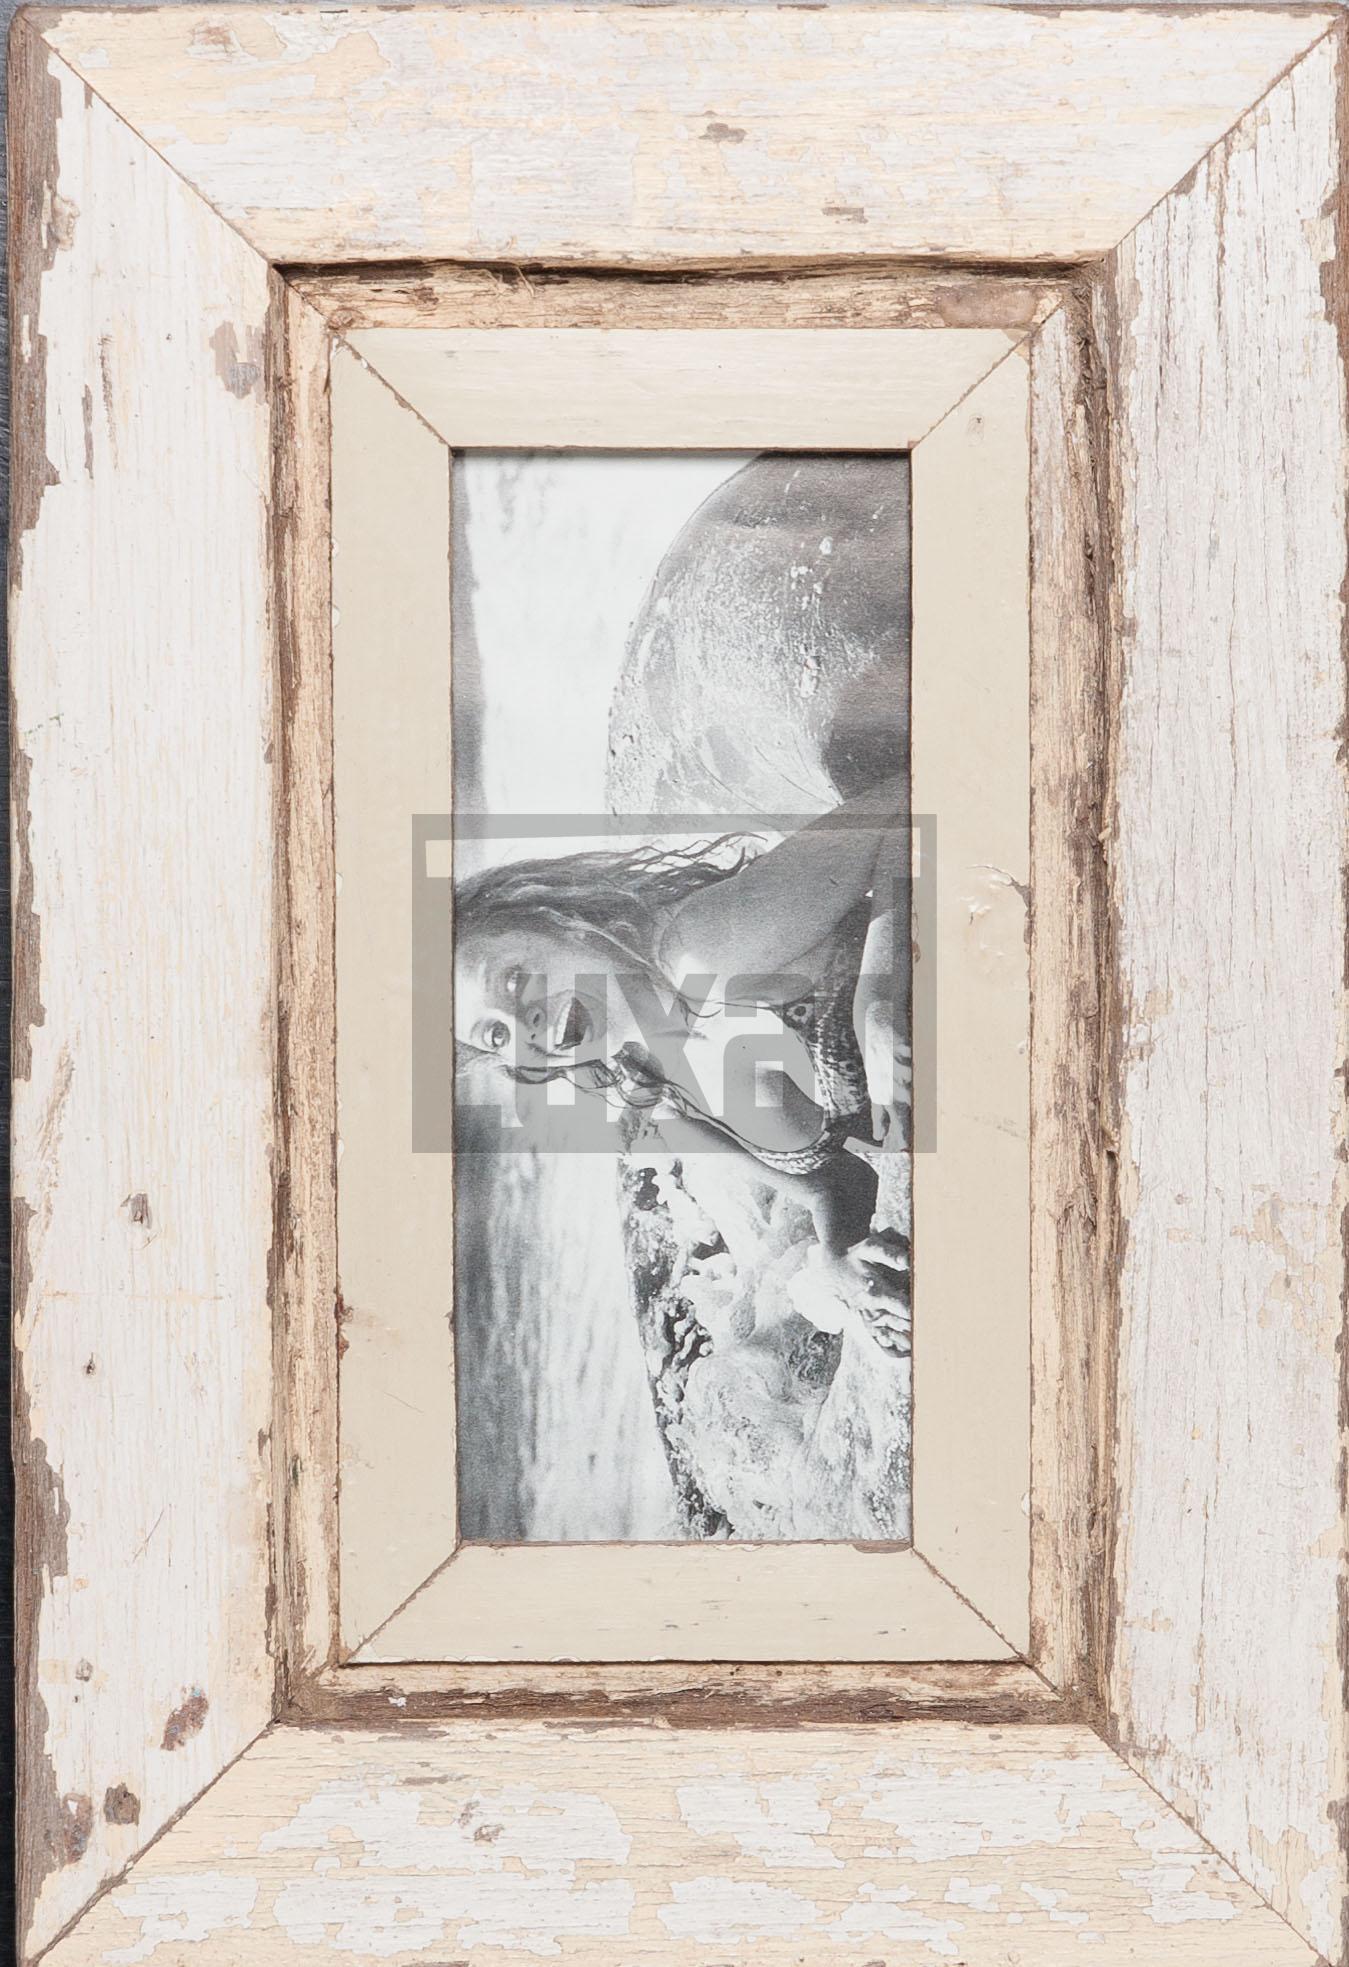 Panorama-Fotorahmen aus Recyclingholz